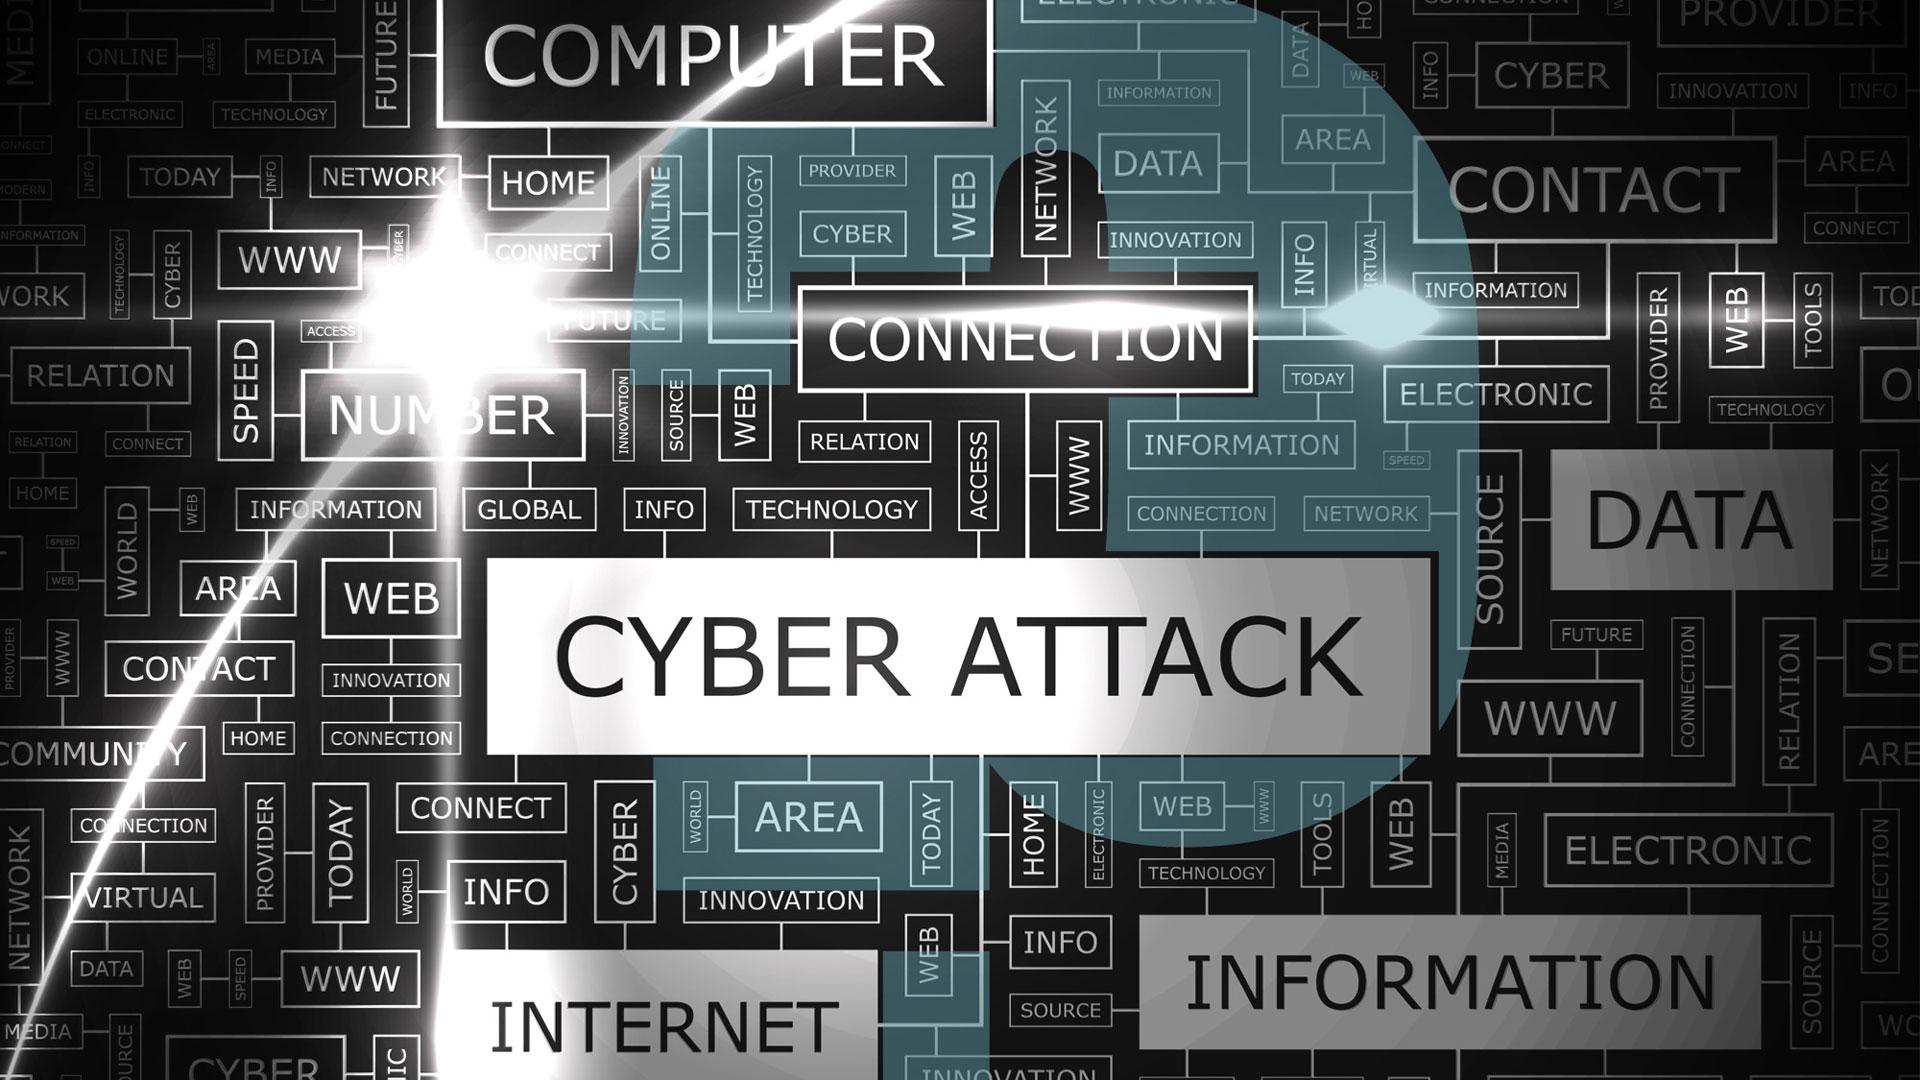 cybercrime_large-2.jpg